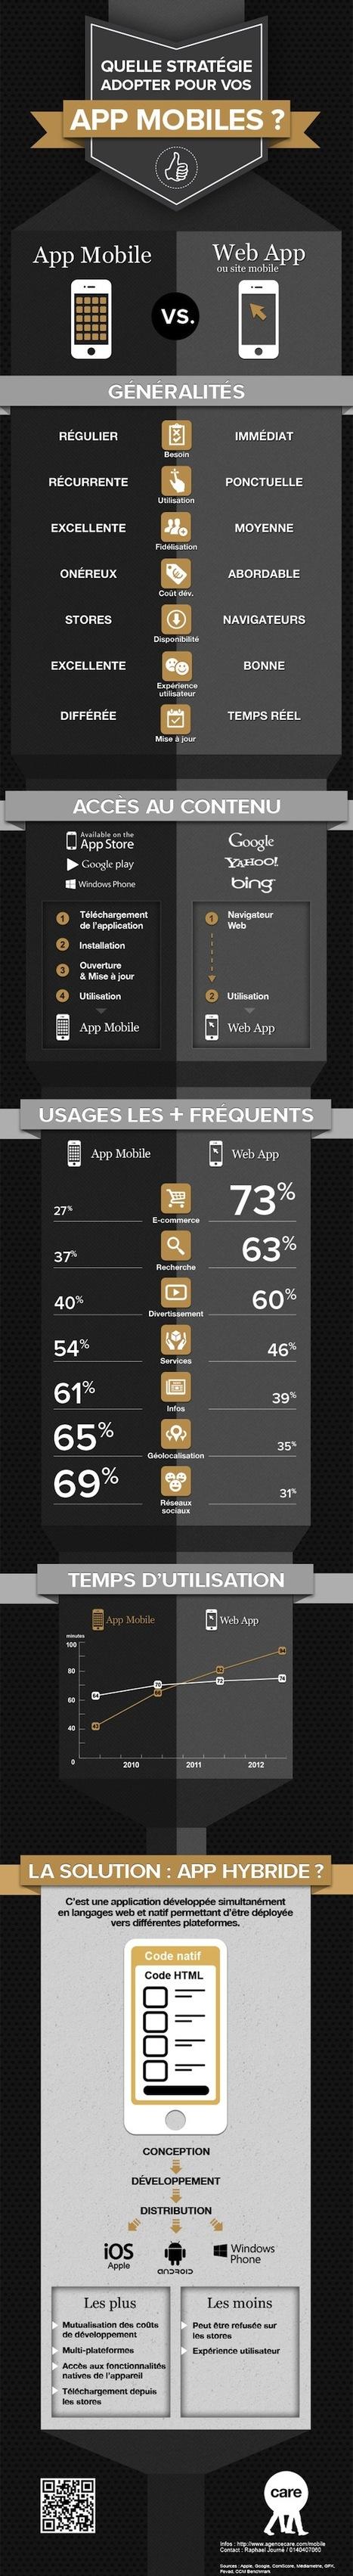 [Infographie] Stratégie mobile : web app ou app mobile ?|FrenchWeb.fr | Radio 2.0 (En & Fr) | Scoop.it